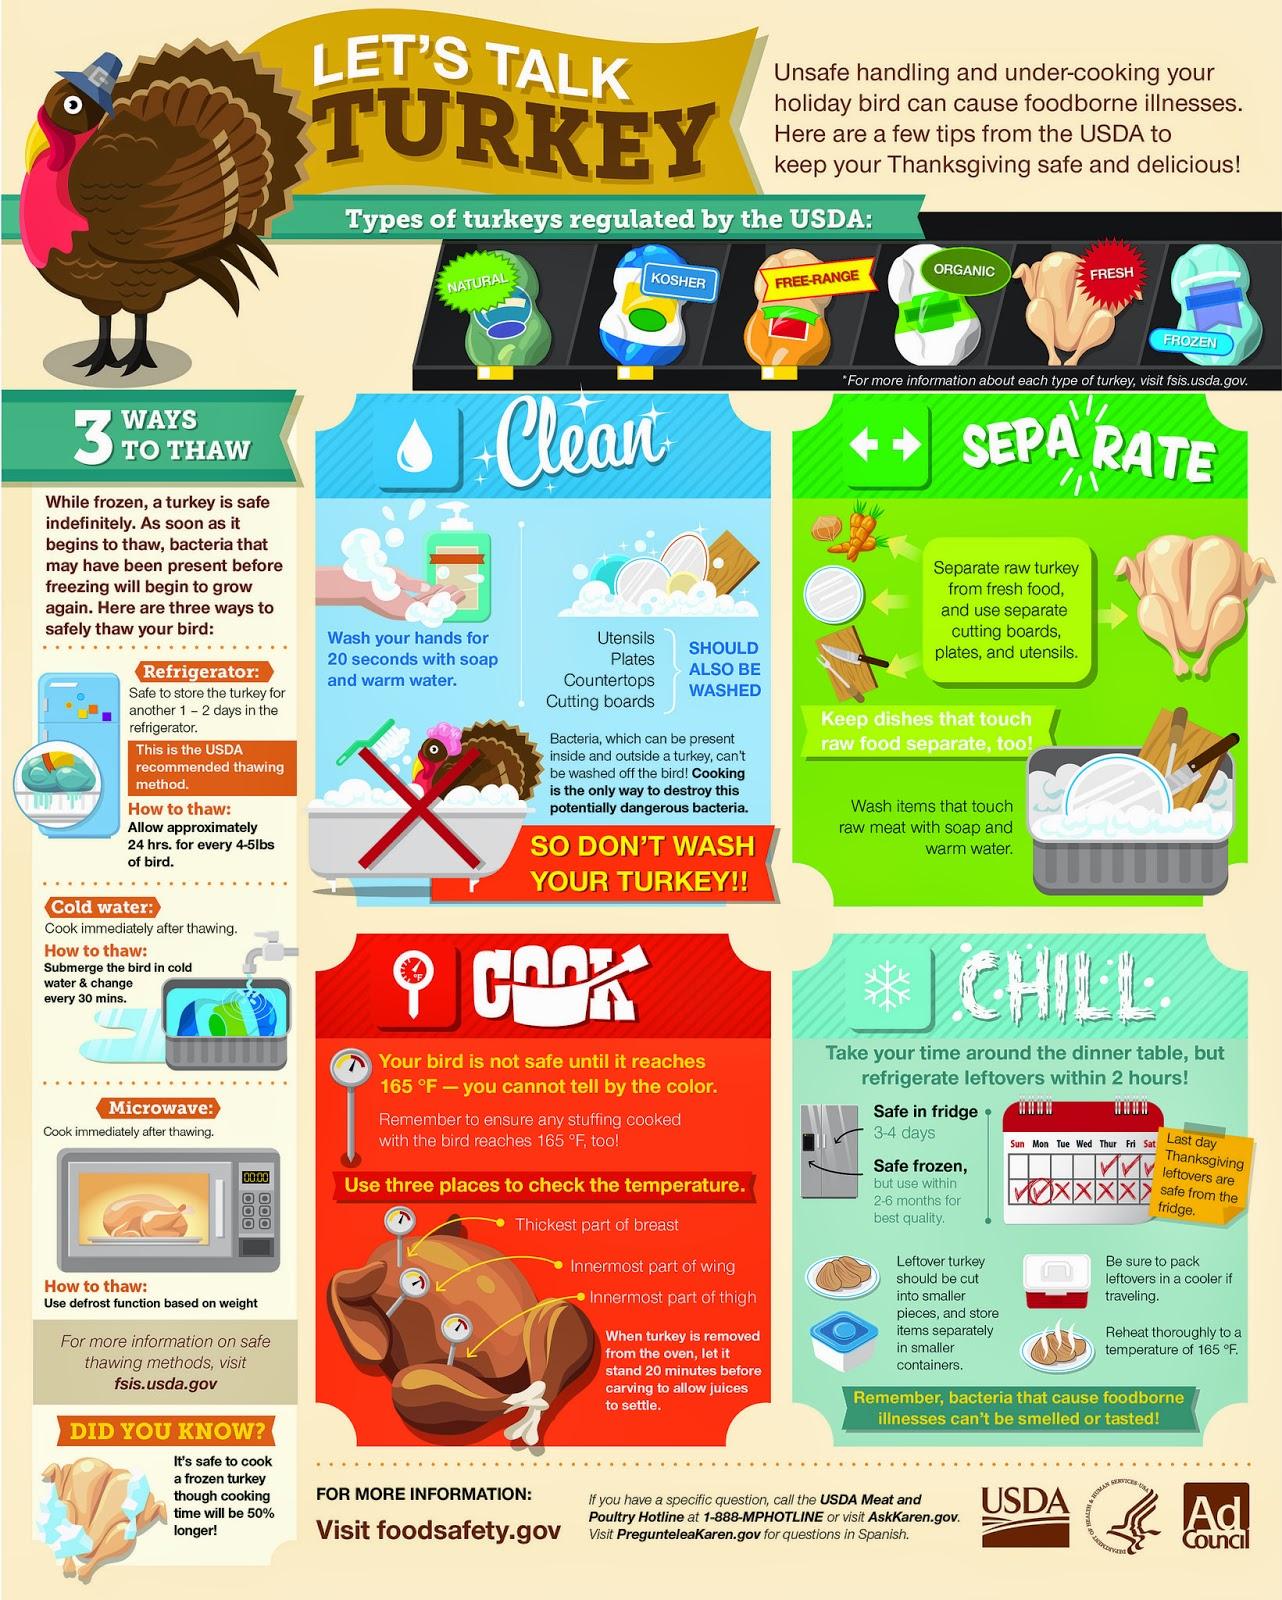 http://www.foodsafety.gov/blog/sites/default/files/thanksgiving-infographic-web.jpg